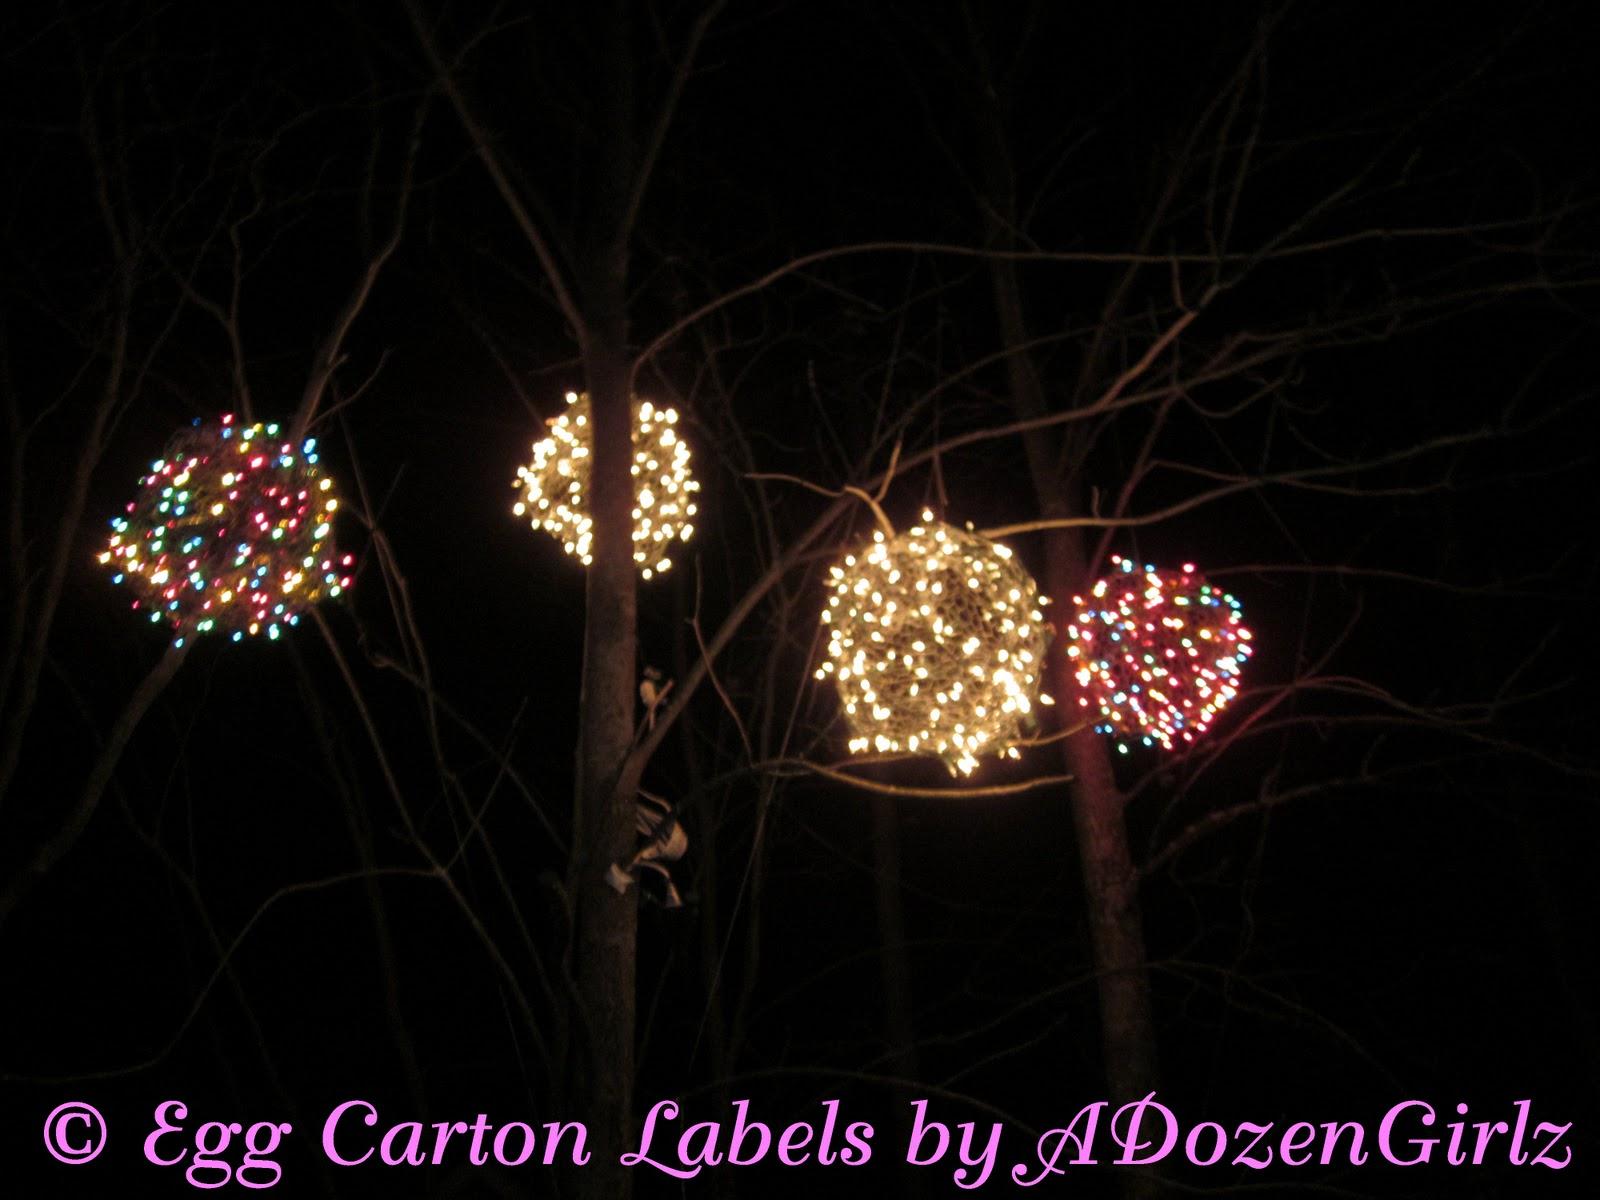 To your outdoors with antique outdoor lights warisan lighting - Christmas Light Balls Outdoors Warisan Lighting